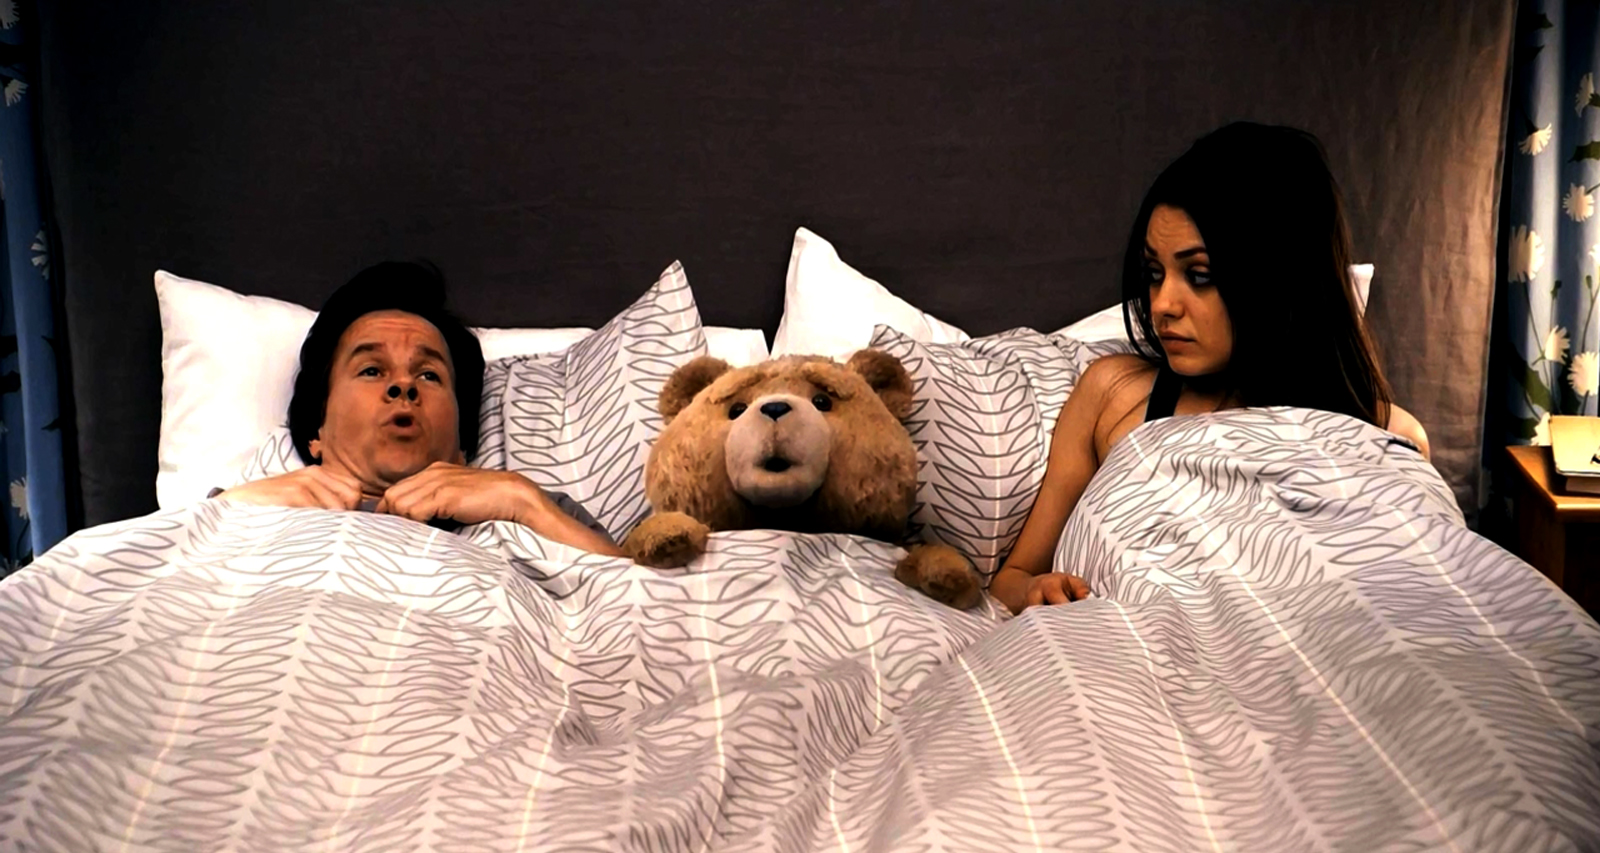 http://3.bp.blogspot.com/-_u8hiuIS-8Y/UHOzP2uwN4I/AAAAAAAALqE/83Q7YcKs7gM/s1600/Mark_Wahlberg_Ted_and_Mila_Kunis_Ted_2012_Movie_HD_Wallpaper-Vvallpaper.Net.jpg